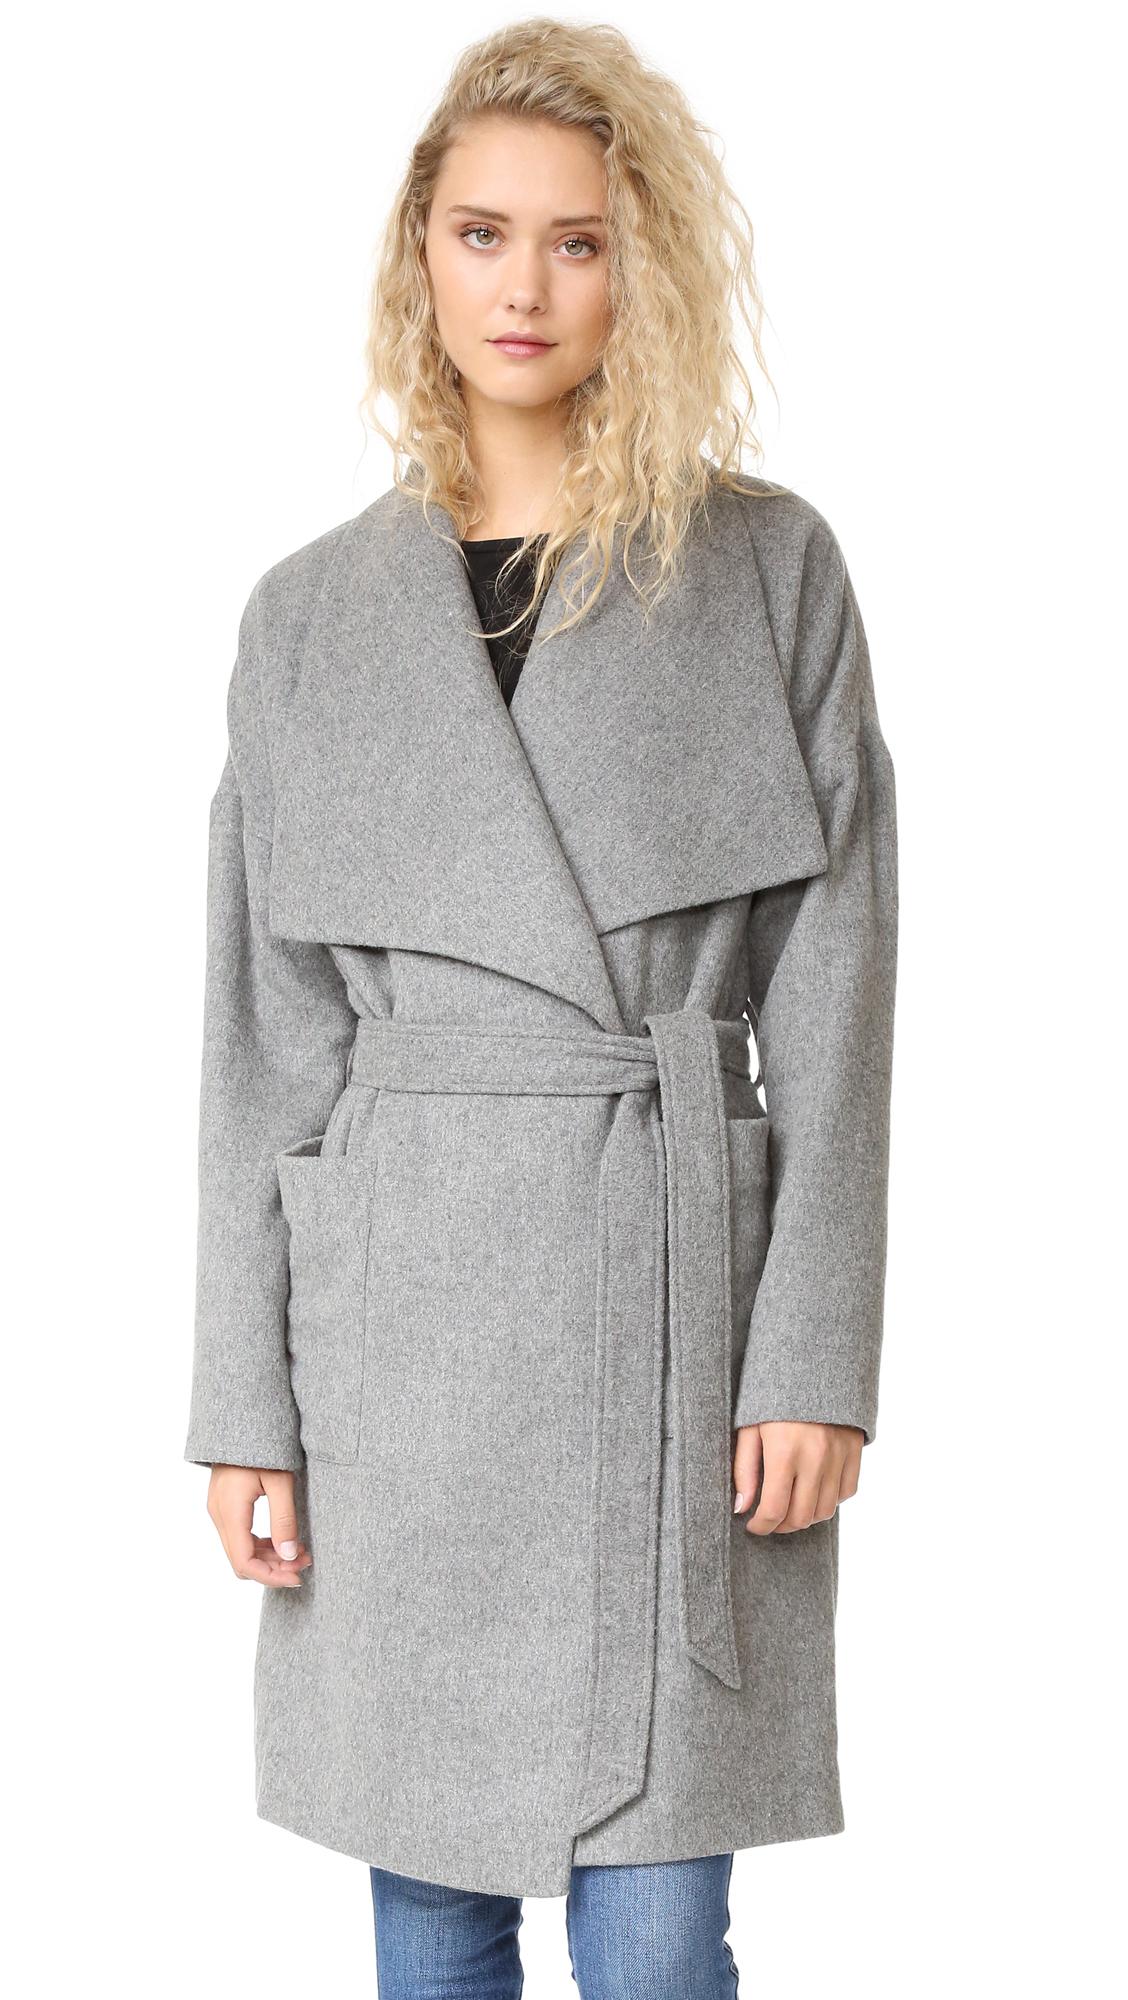 Madewell Delancey Blanket Coat - Heather Grey